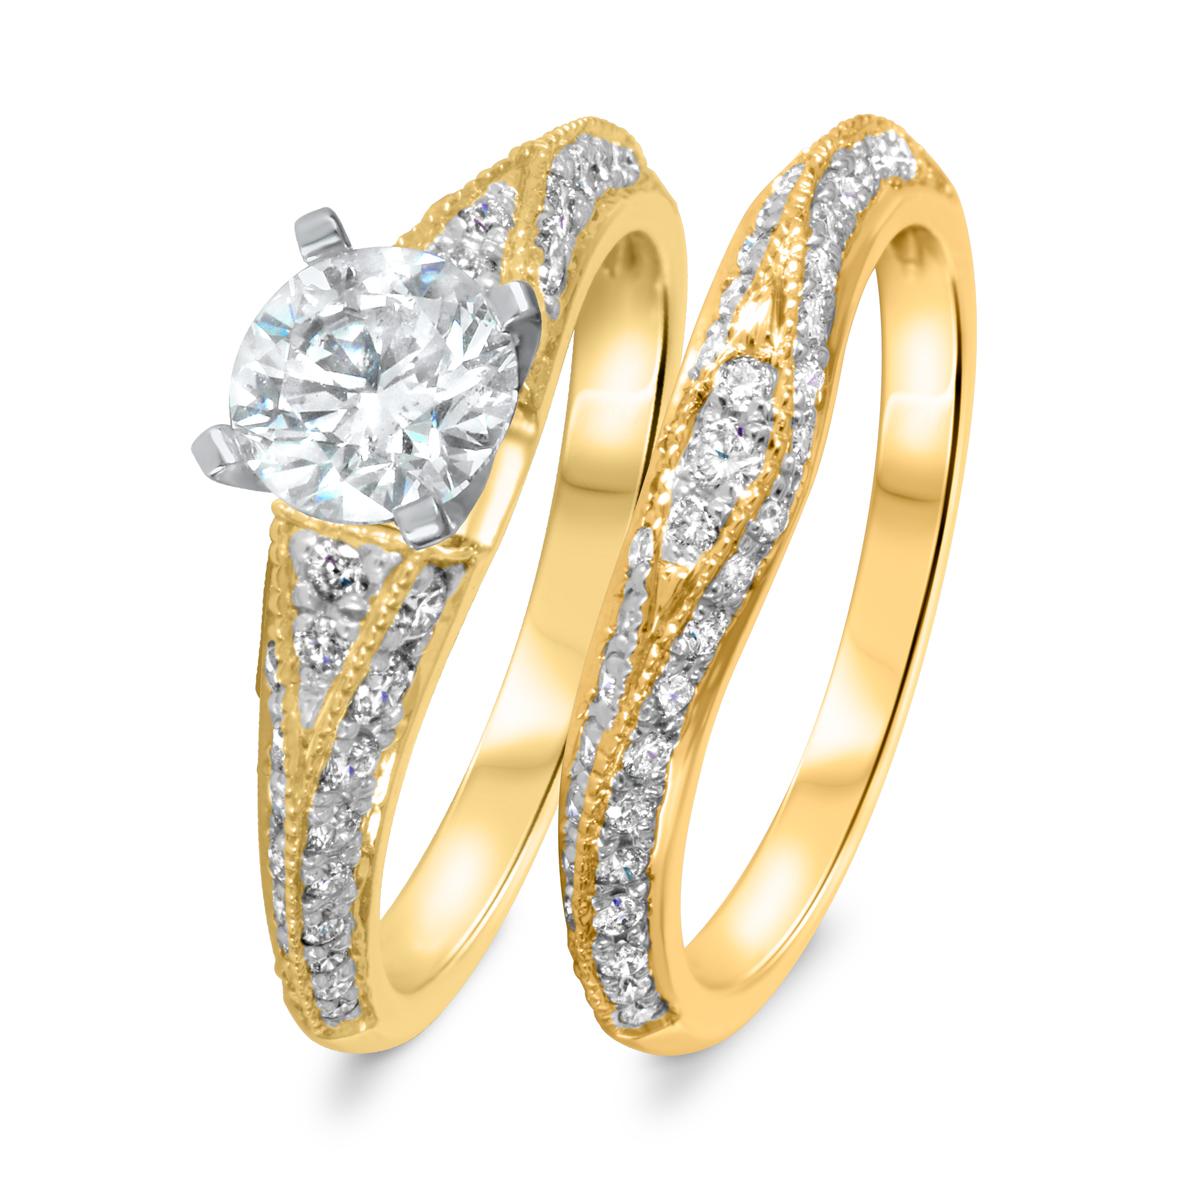 1 7/8 CT. T.W. Diamond Women's Bridal Wedding Ring Set 14K Yellow Gold